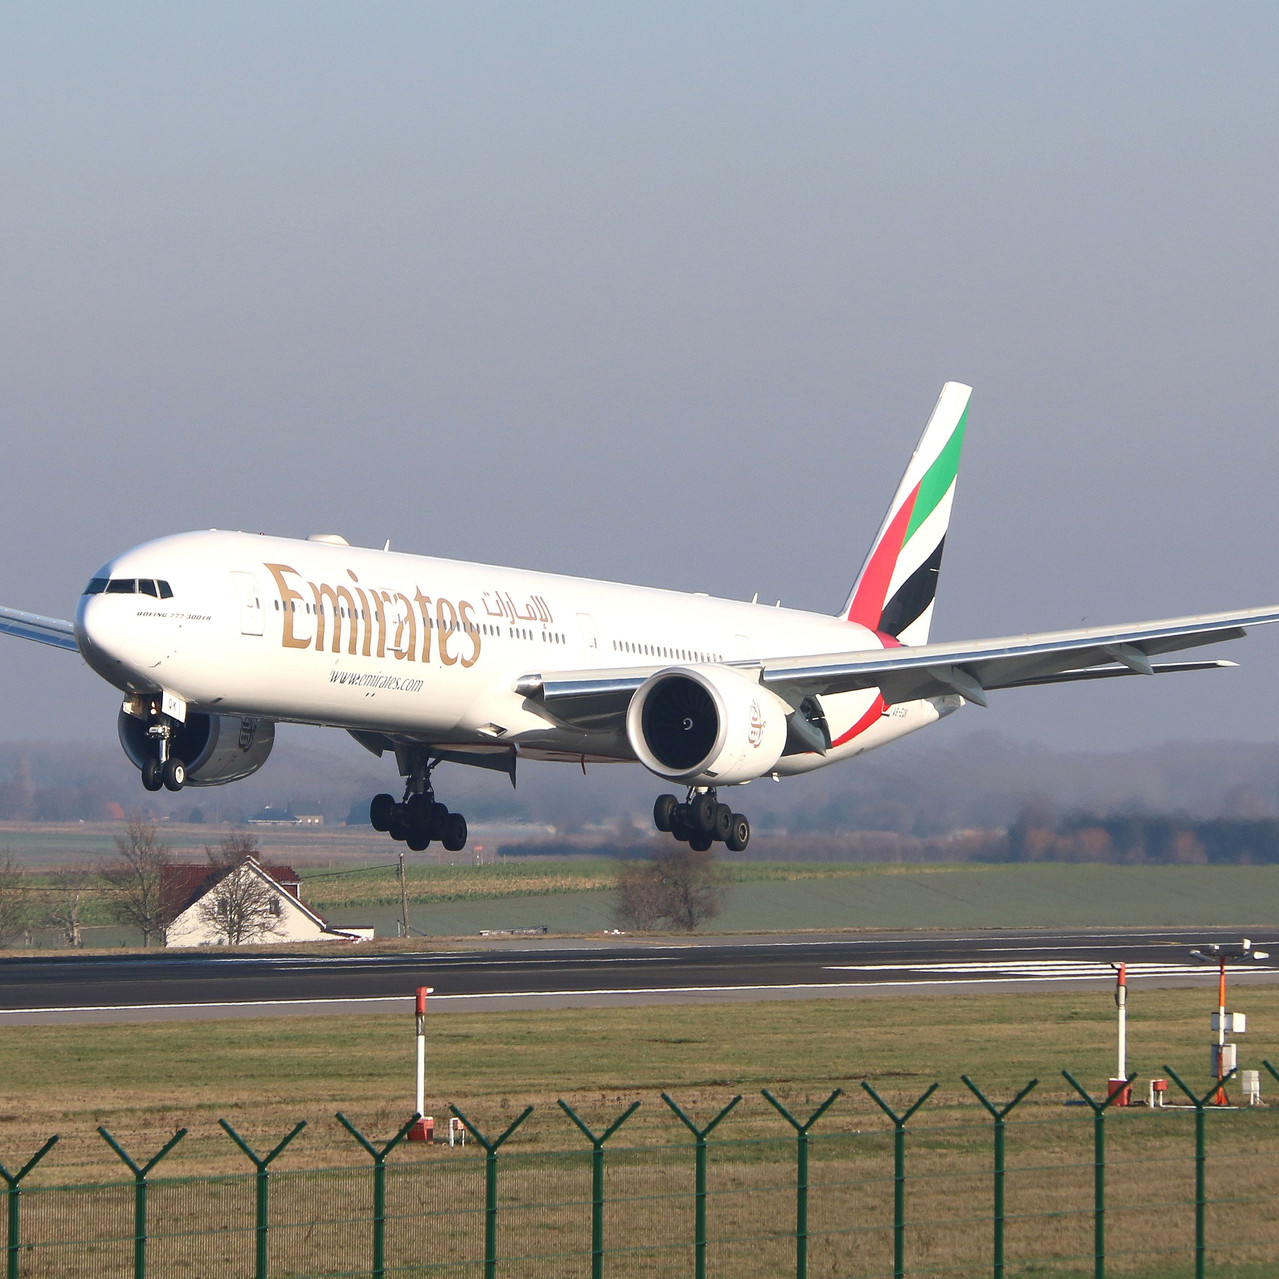 015_Tyler McDowell_3422_Emirates 777 fin